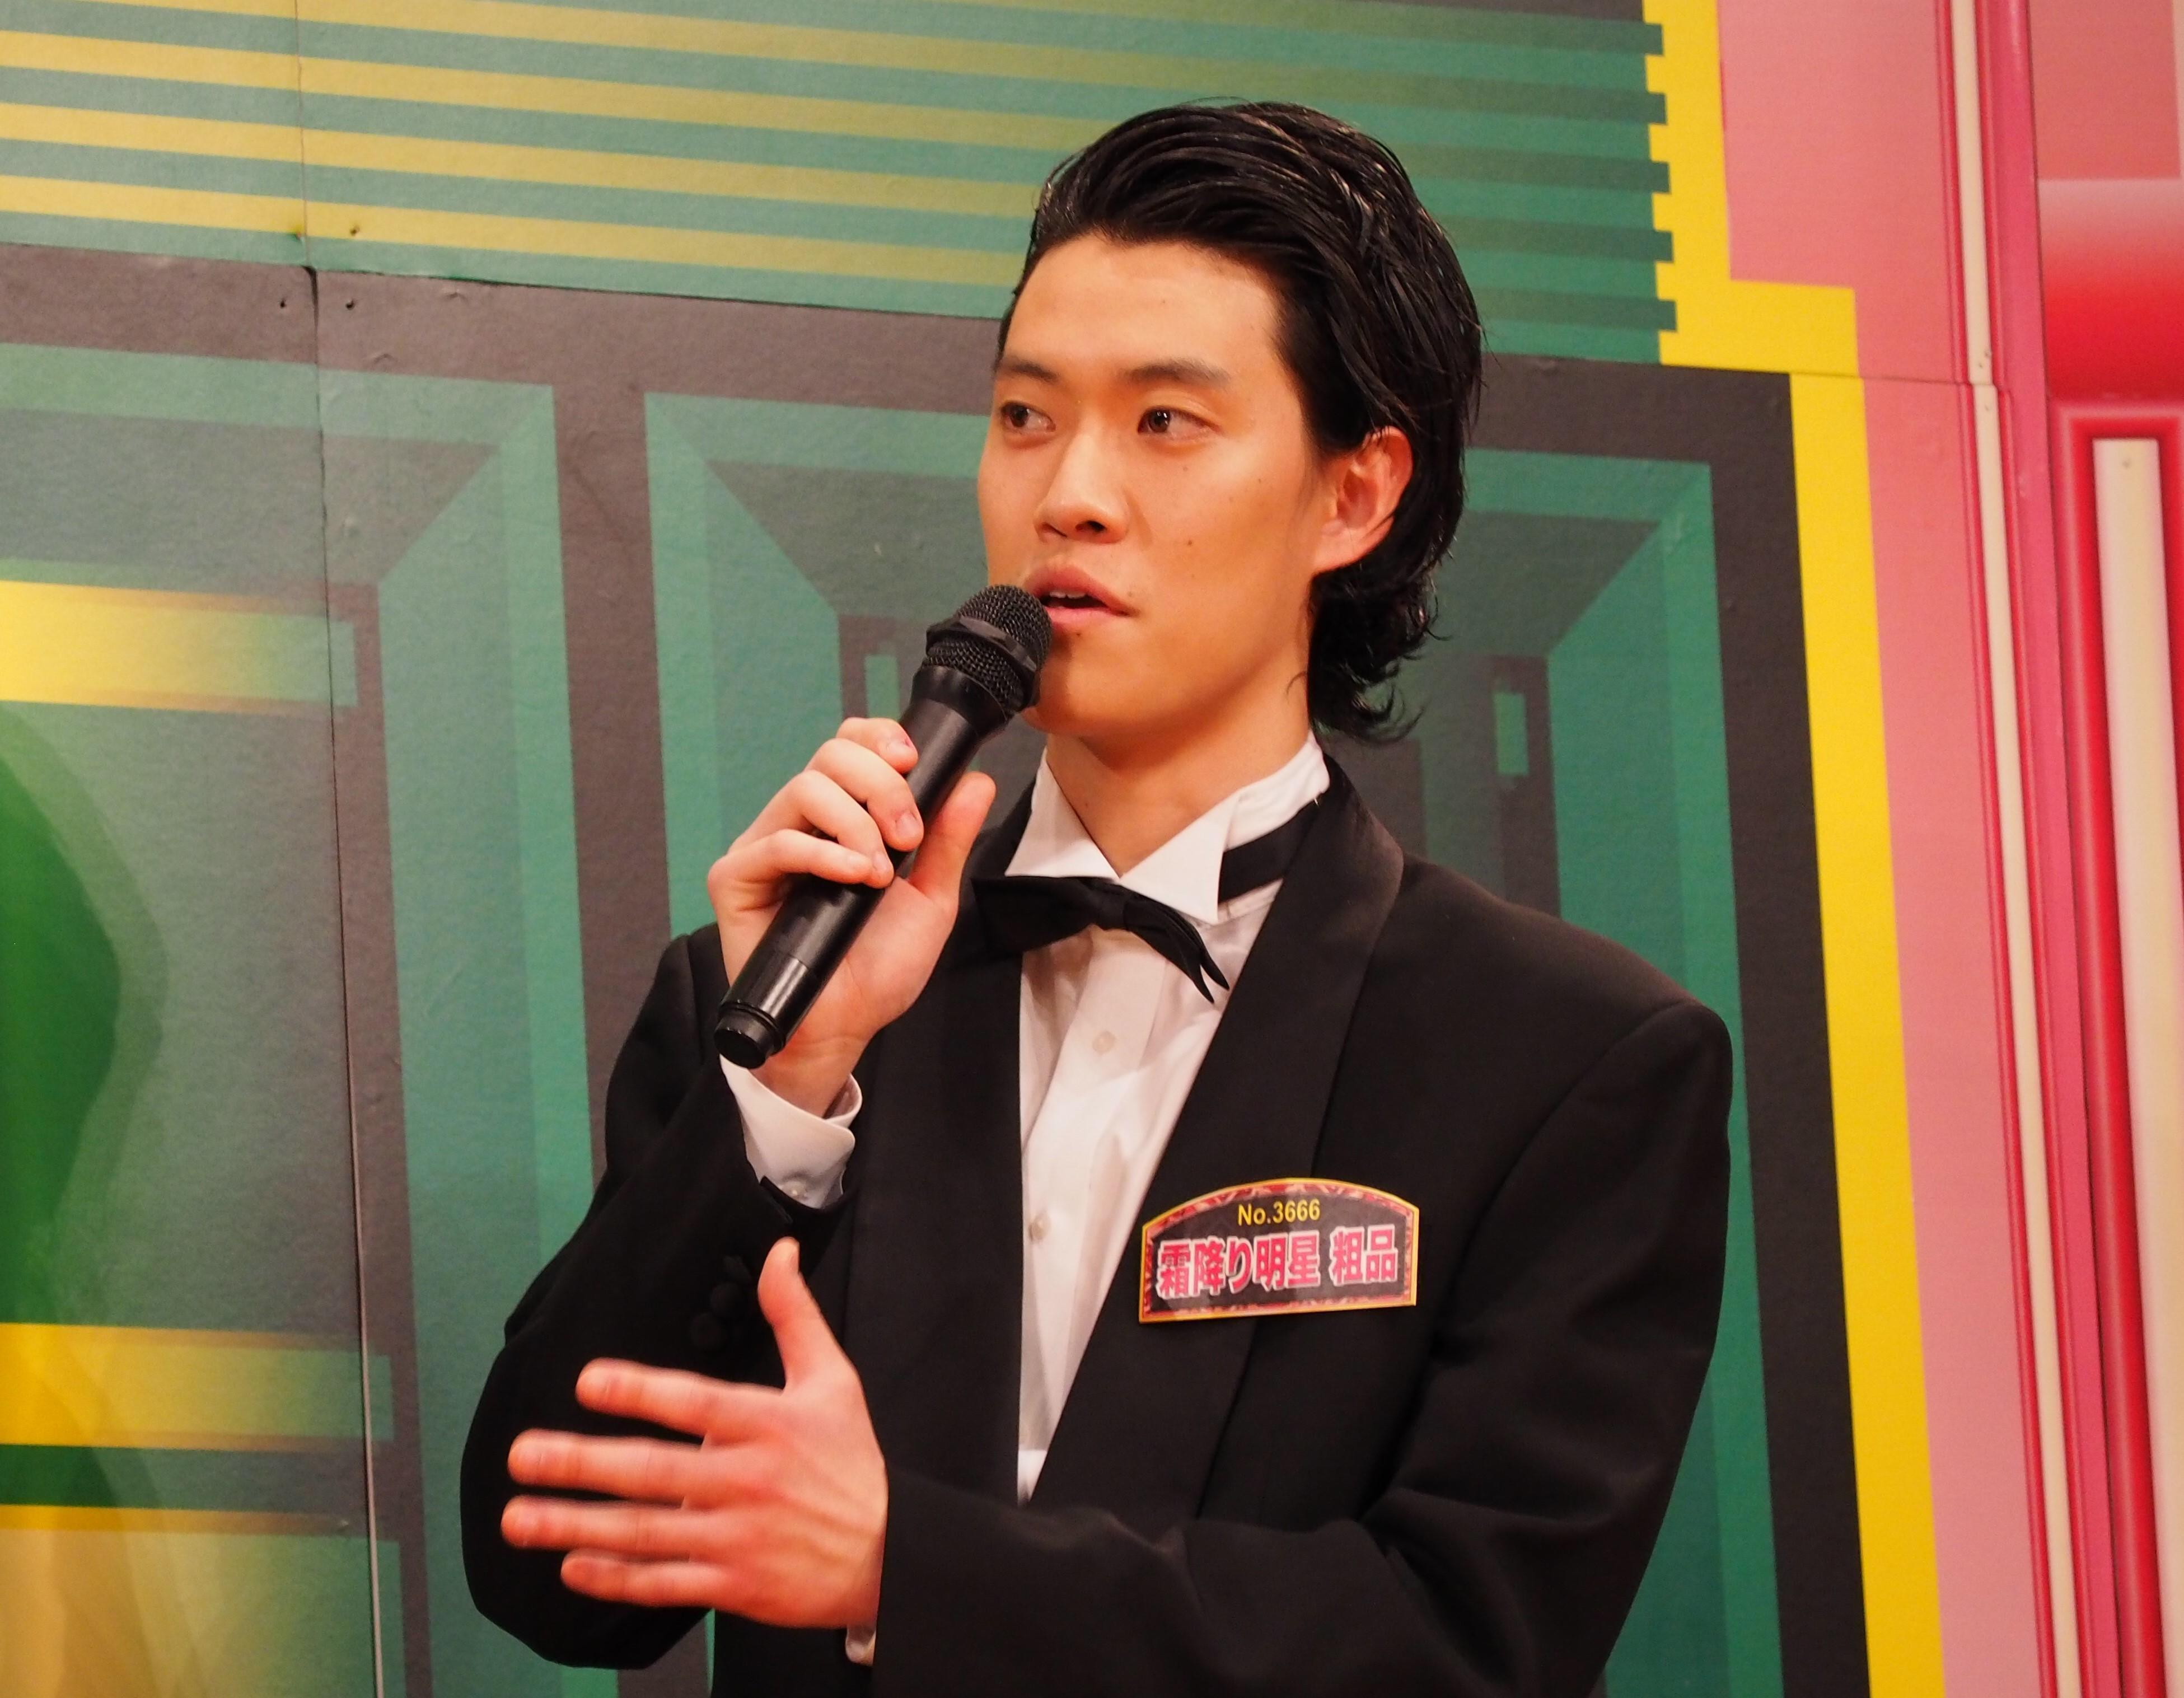 http://news.yoshimoto.co.jp/20180212231956-61180f2c41830f98671d3b38d8d6e2bb4a604639.jpg